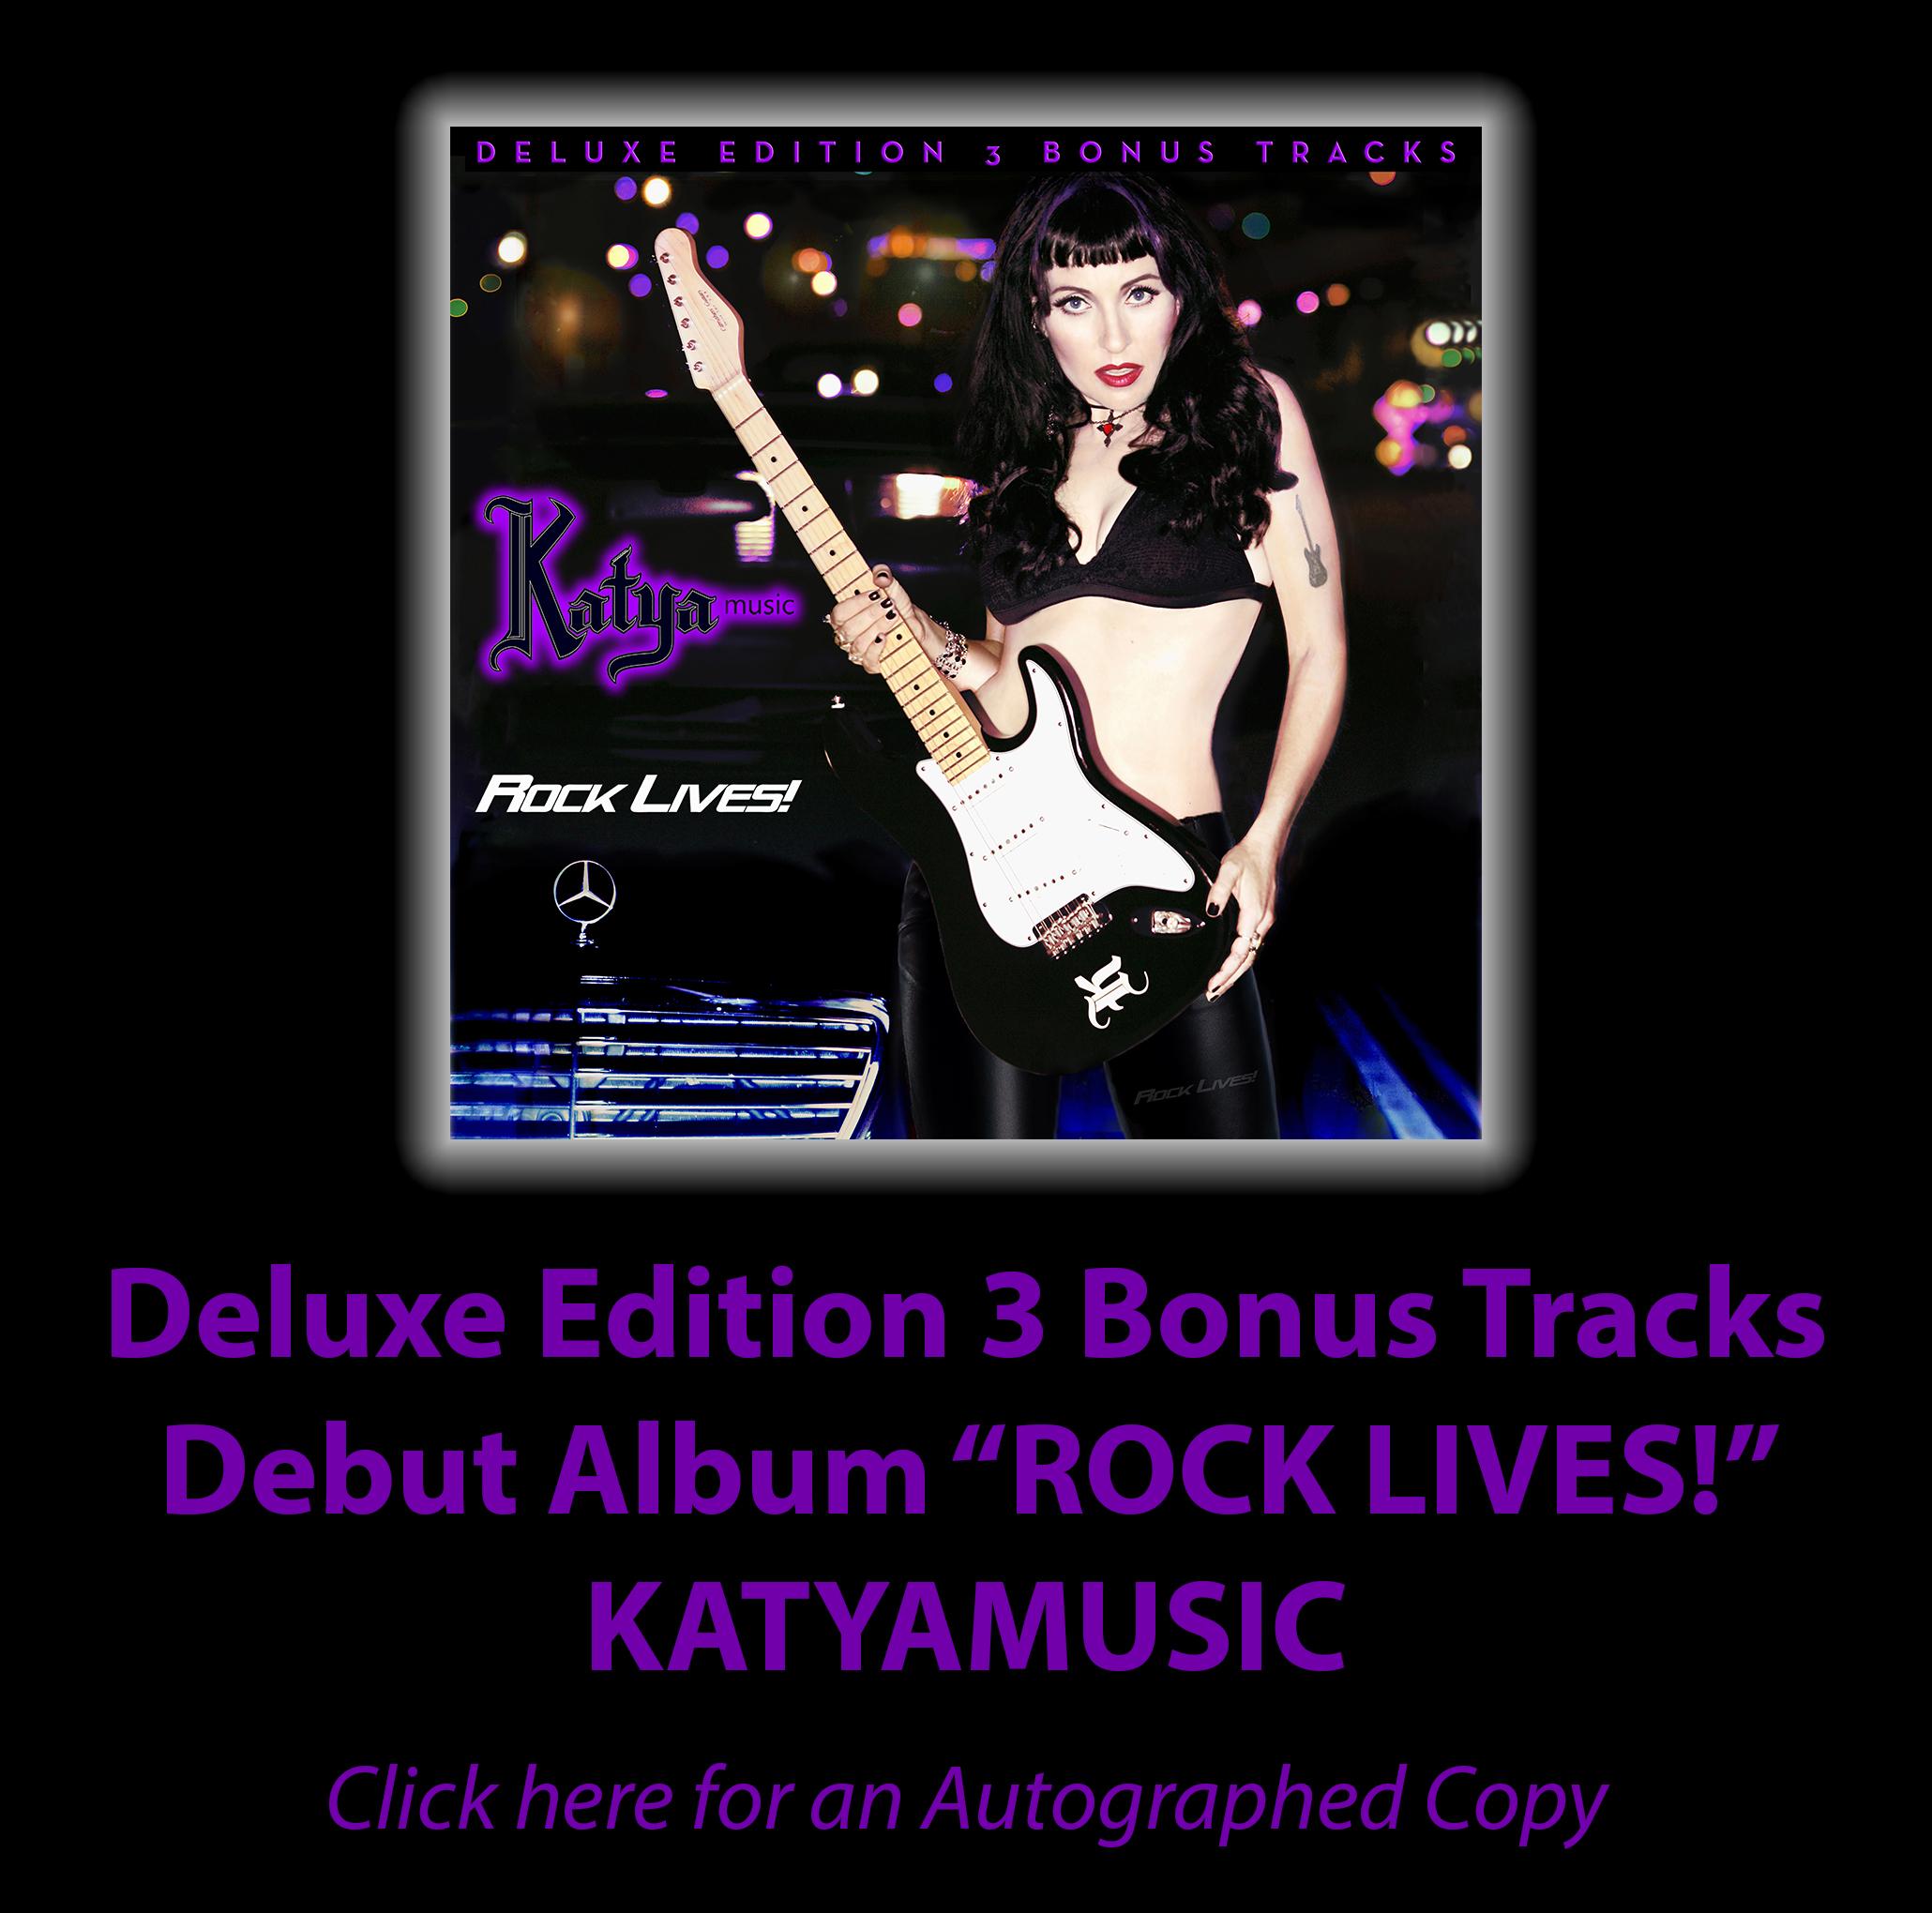 BUY KATYAMUSIC'S DELUXE CD